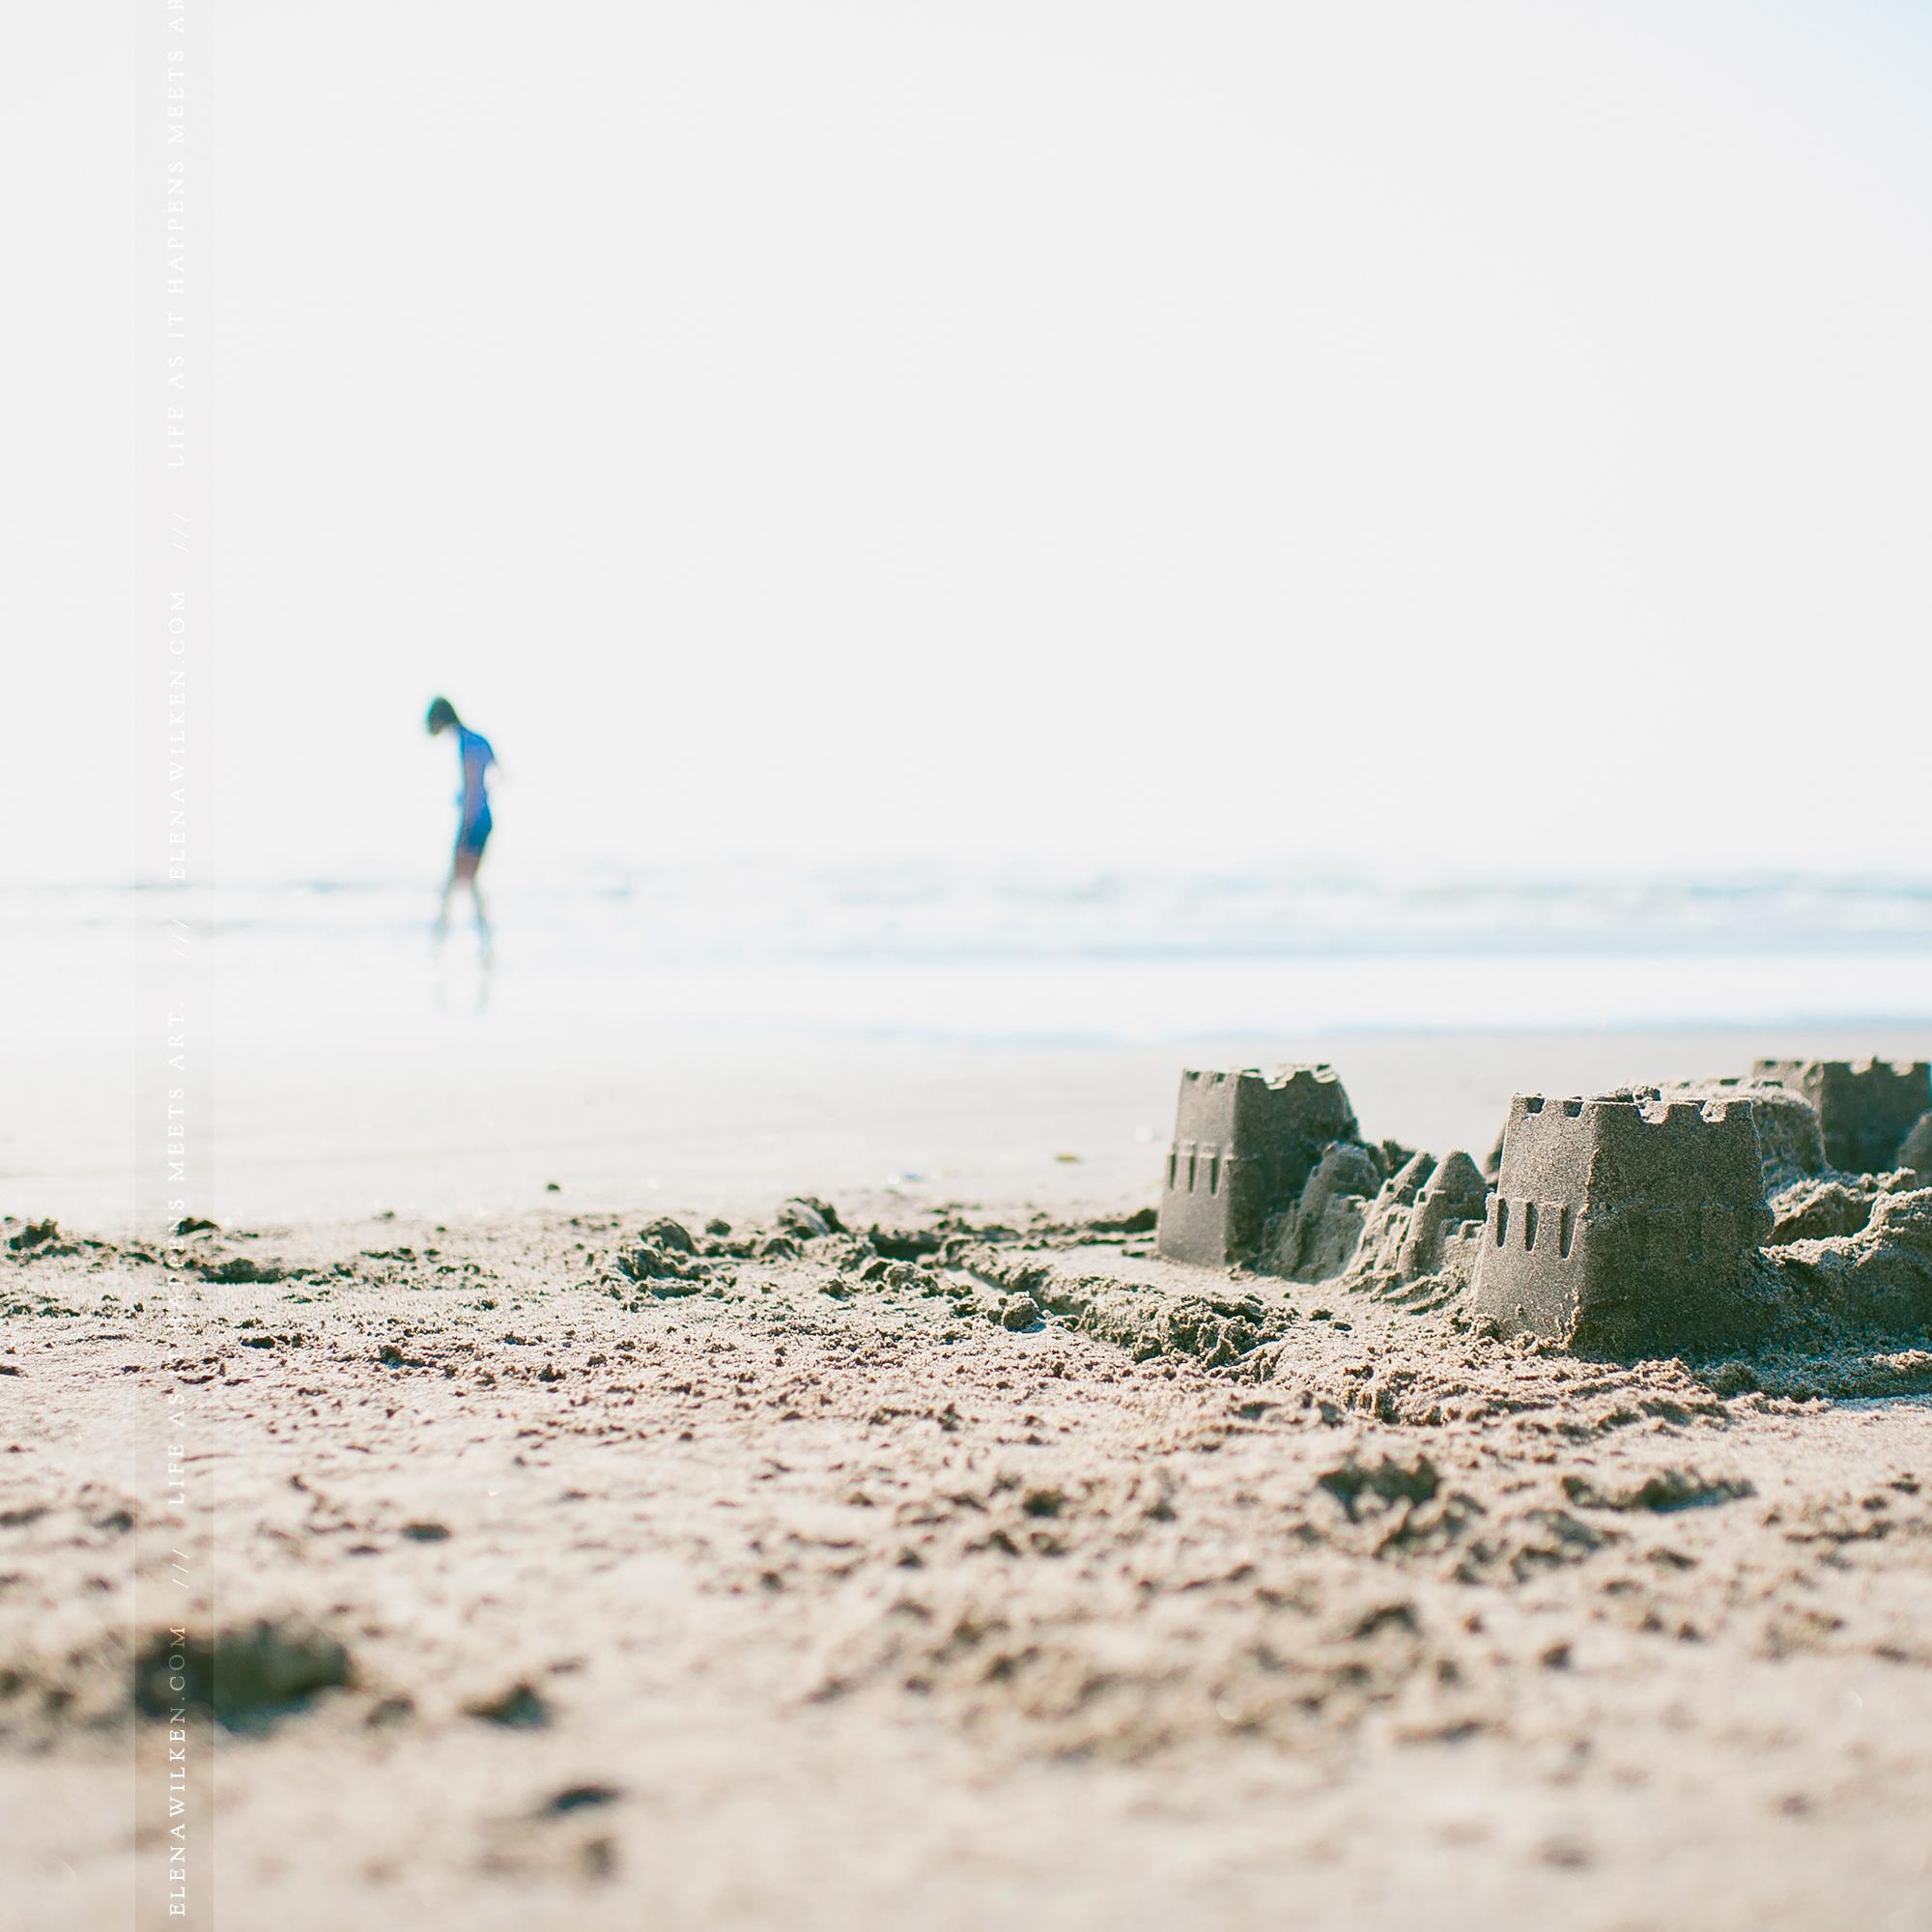 sand-castle-on-the-beach-oregon-coast-elena-wilken.jpg